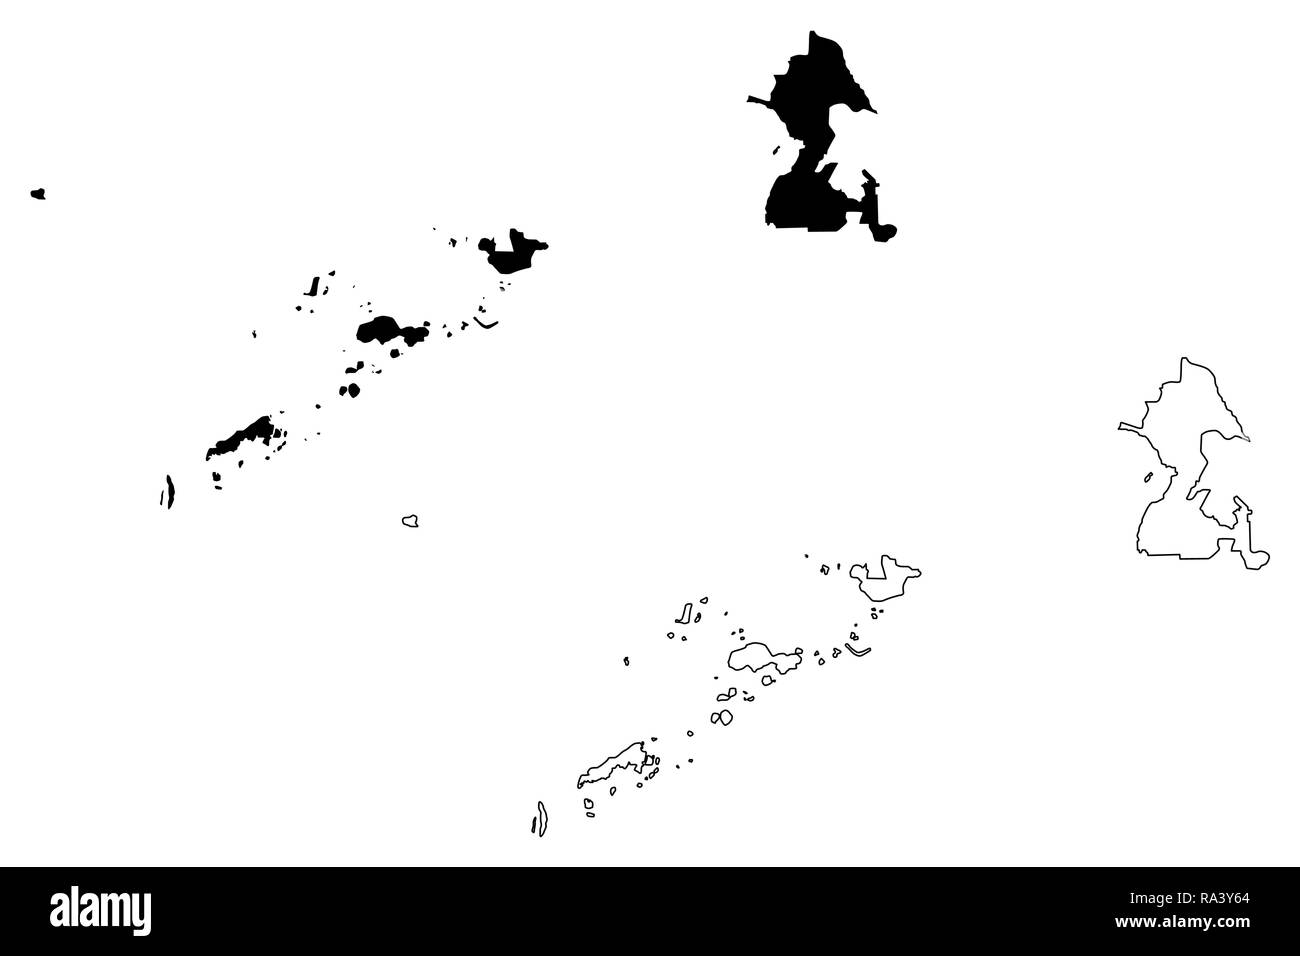 Autonomous Region In Muslim Mindanao Regions And Provinces Of The